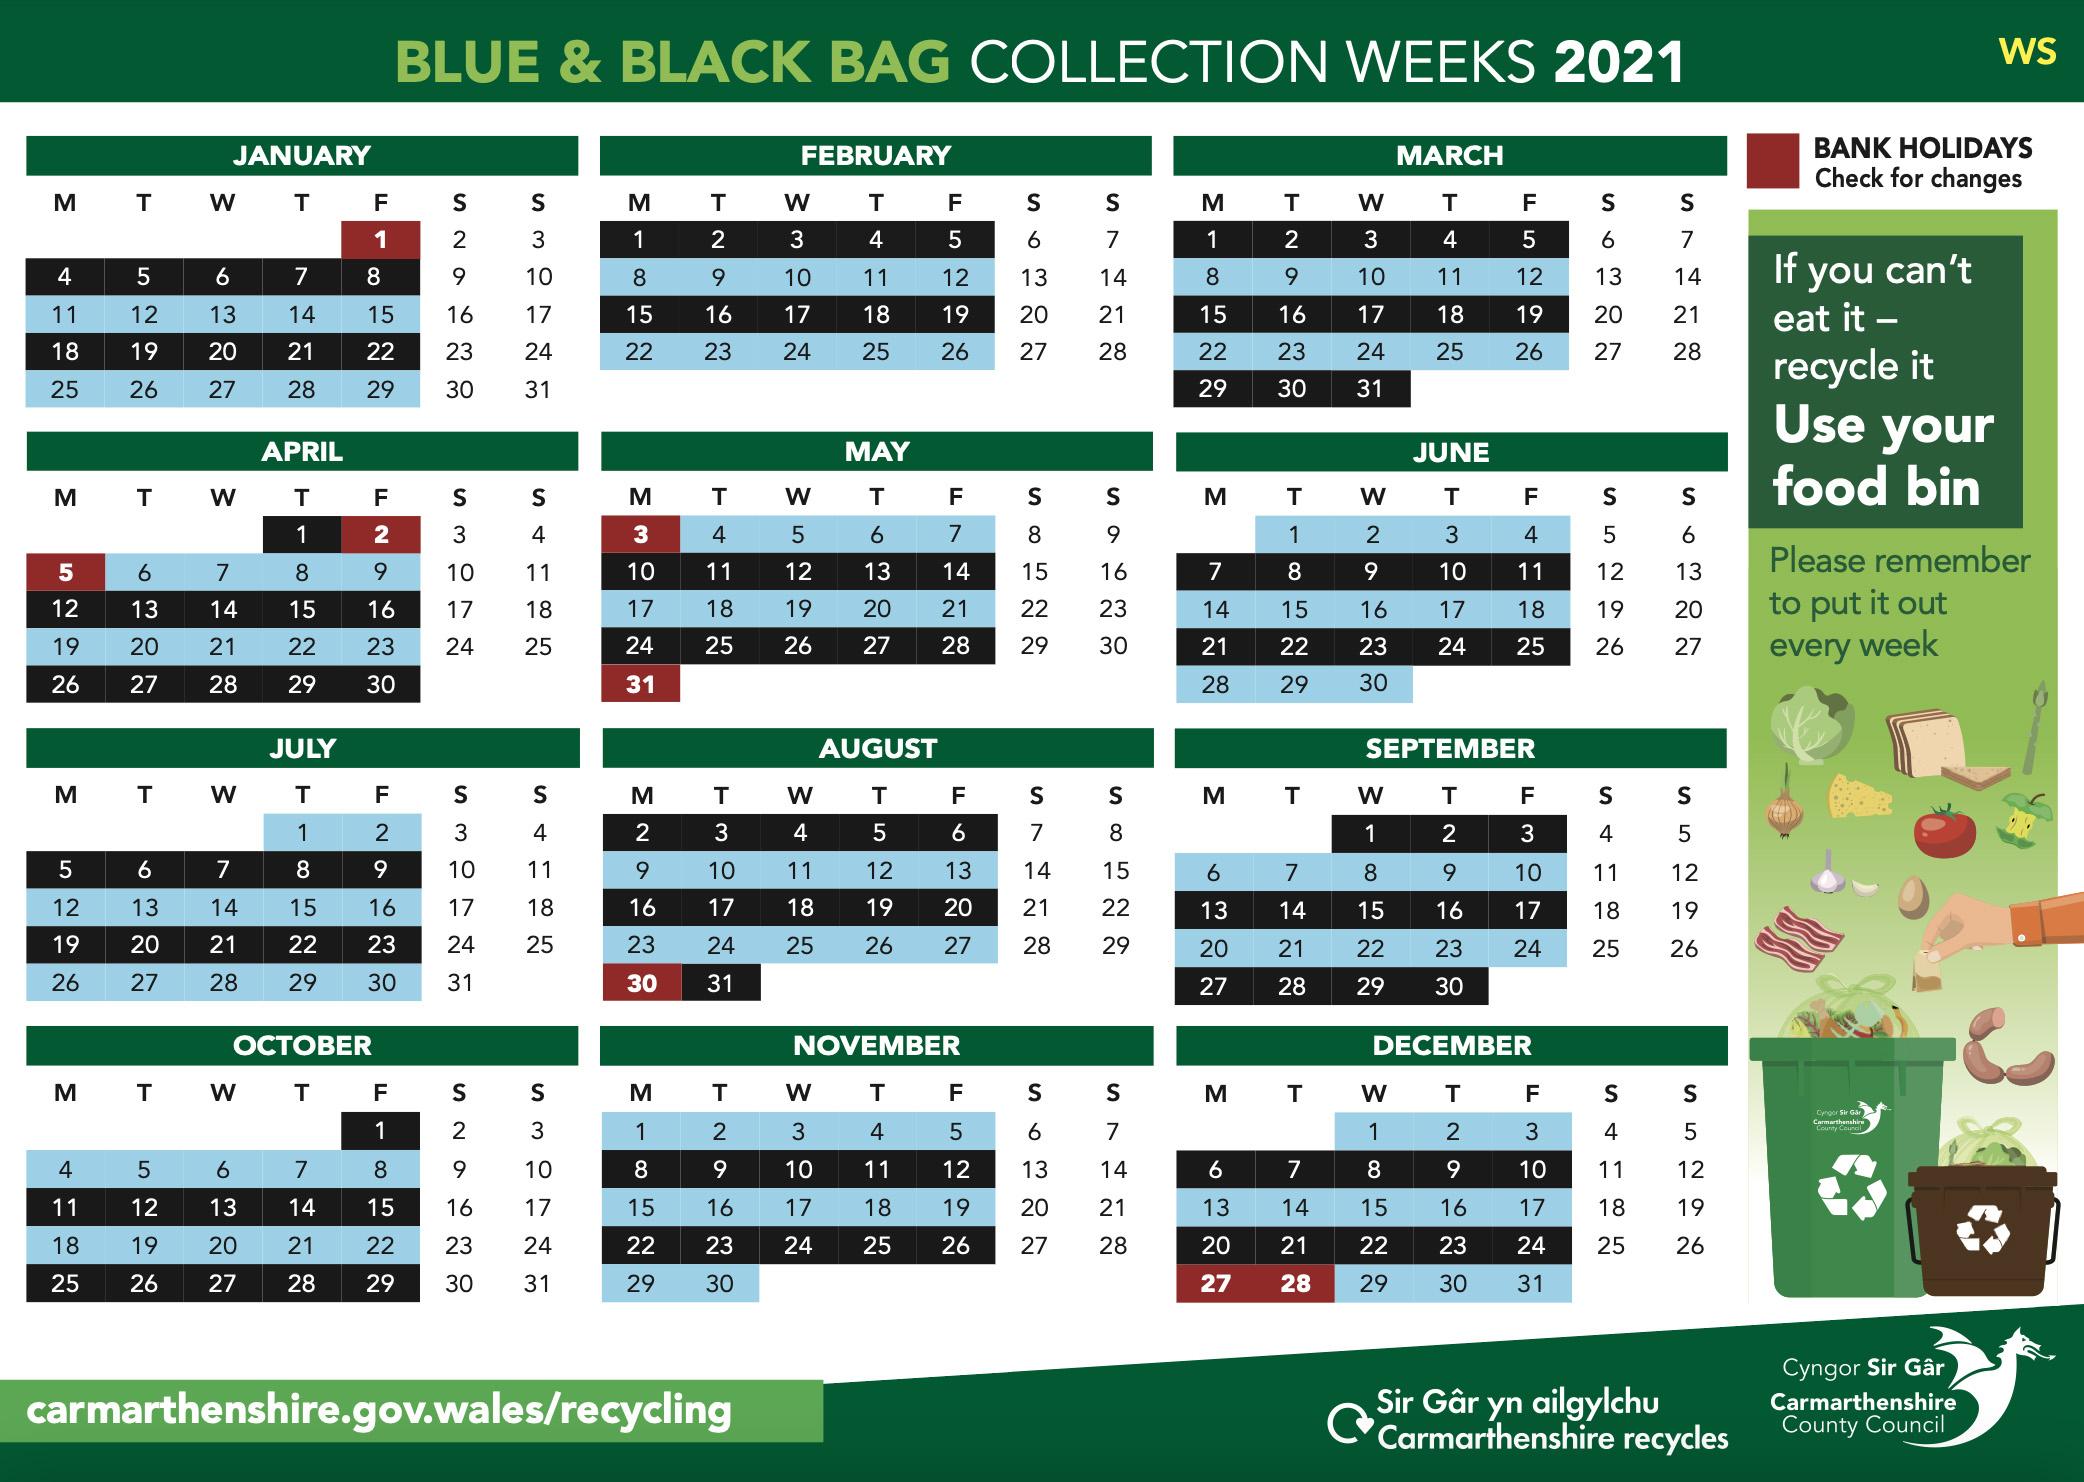 Blue and black bag collection 2021 Llanarthne